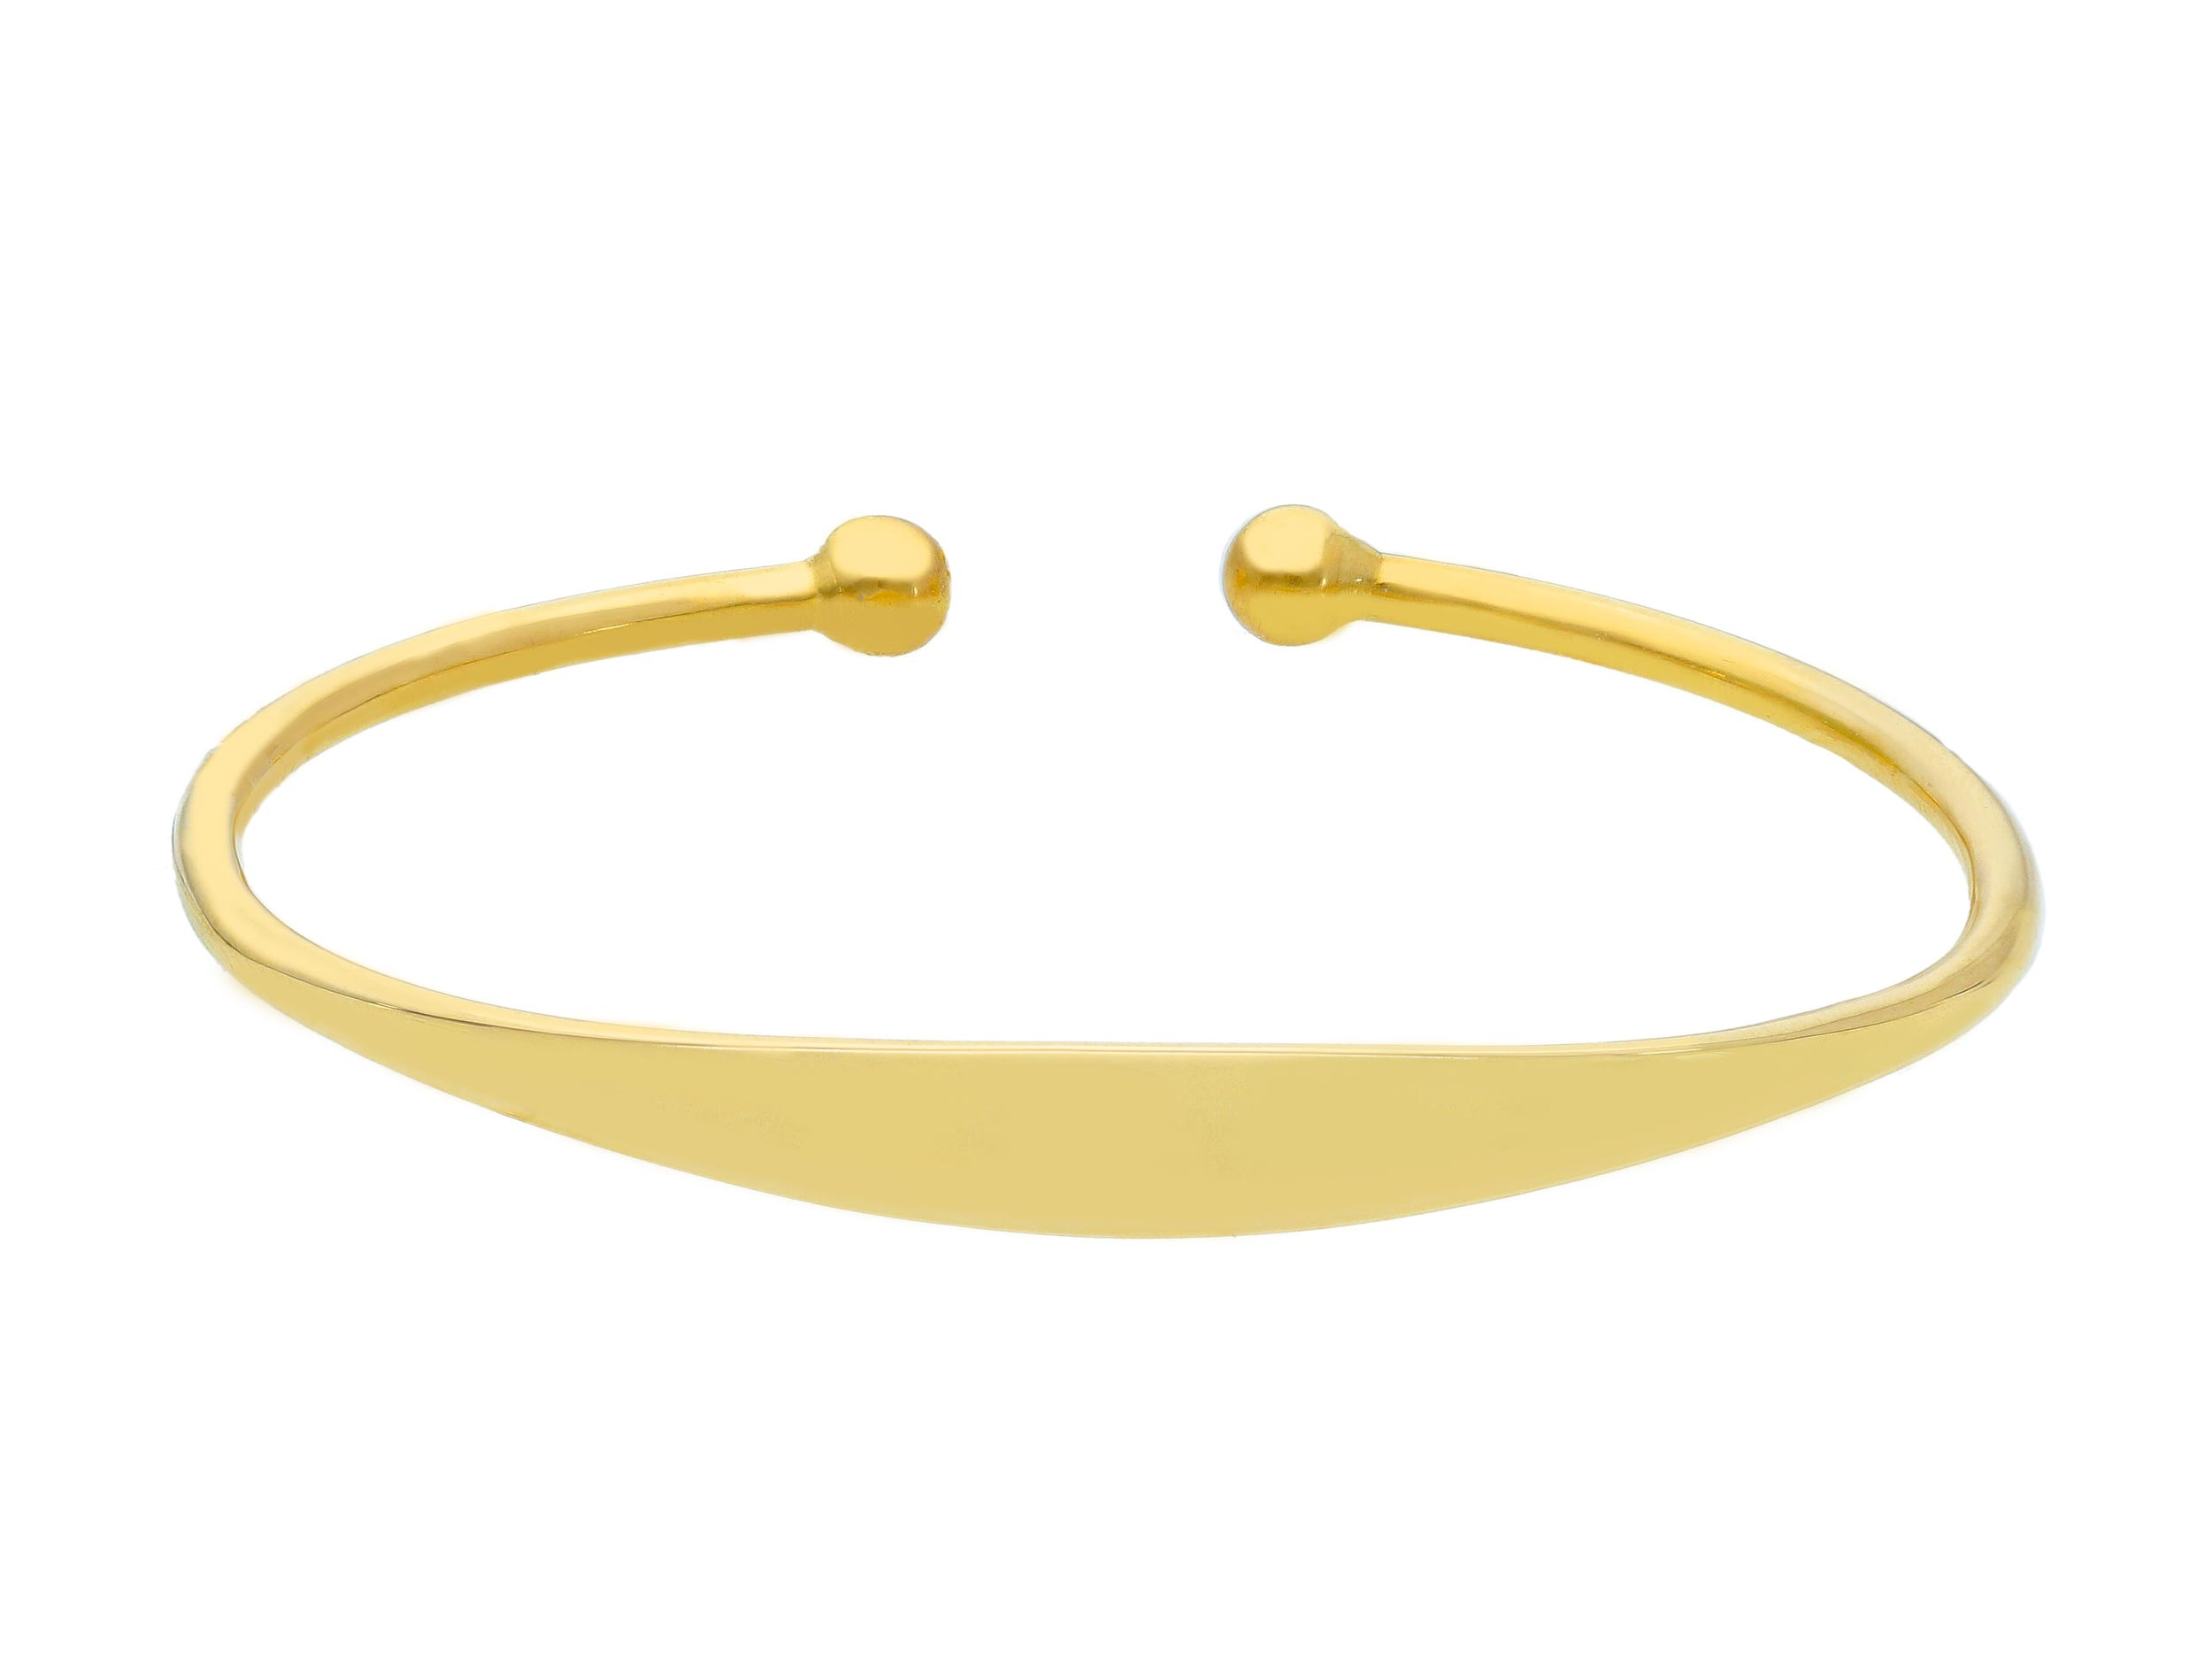 Stylish 18ct Yellow Gold Bracelet Daimeter 60mm